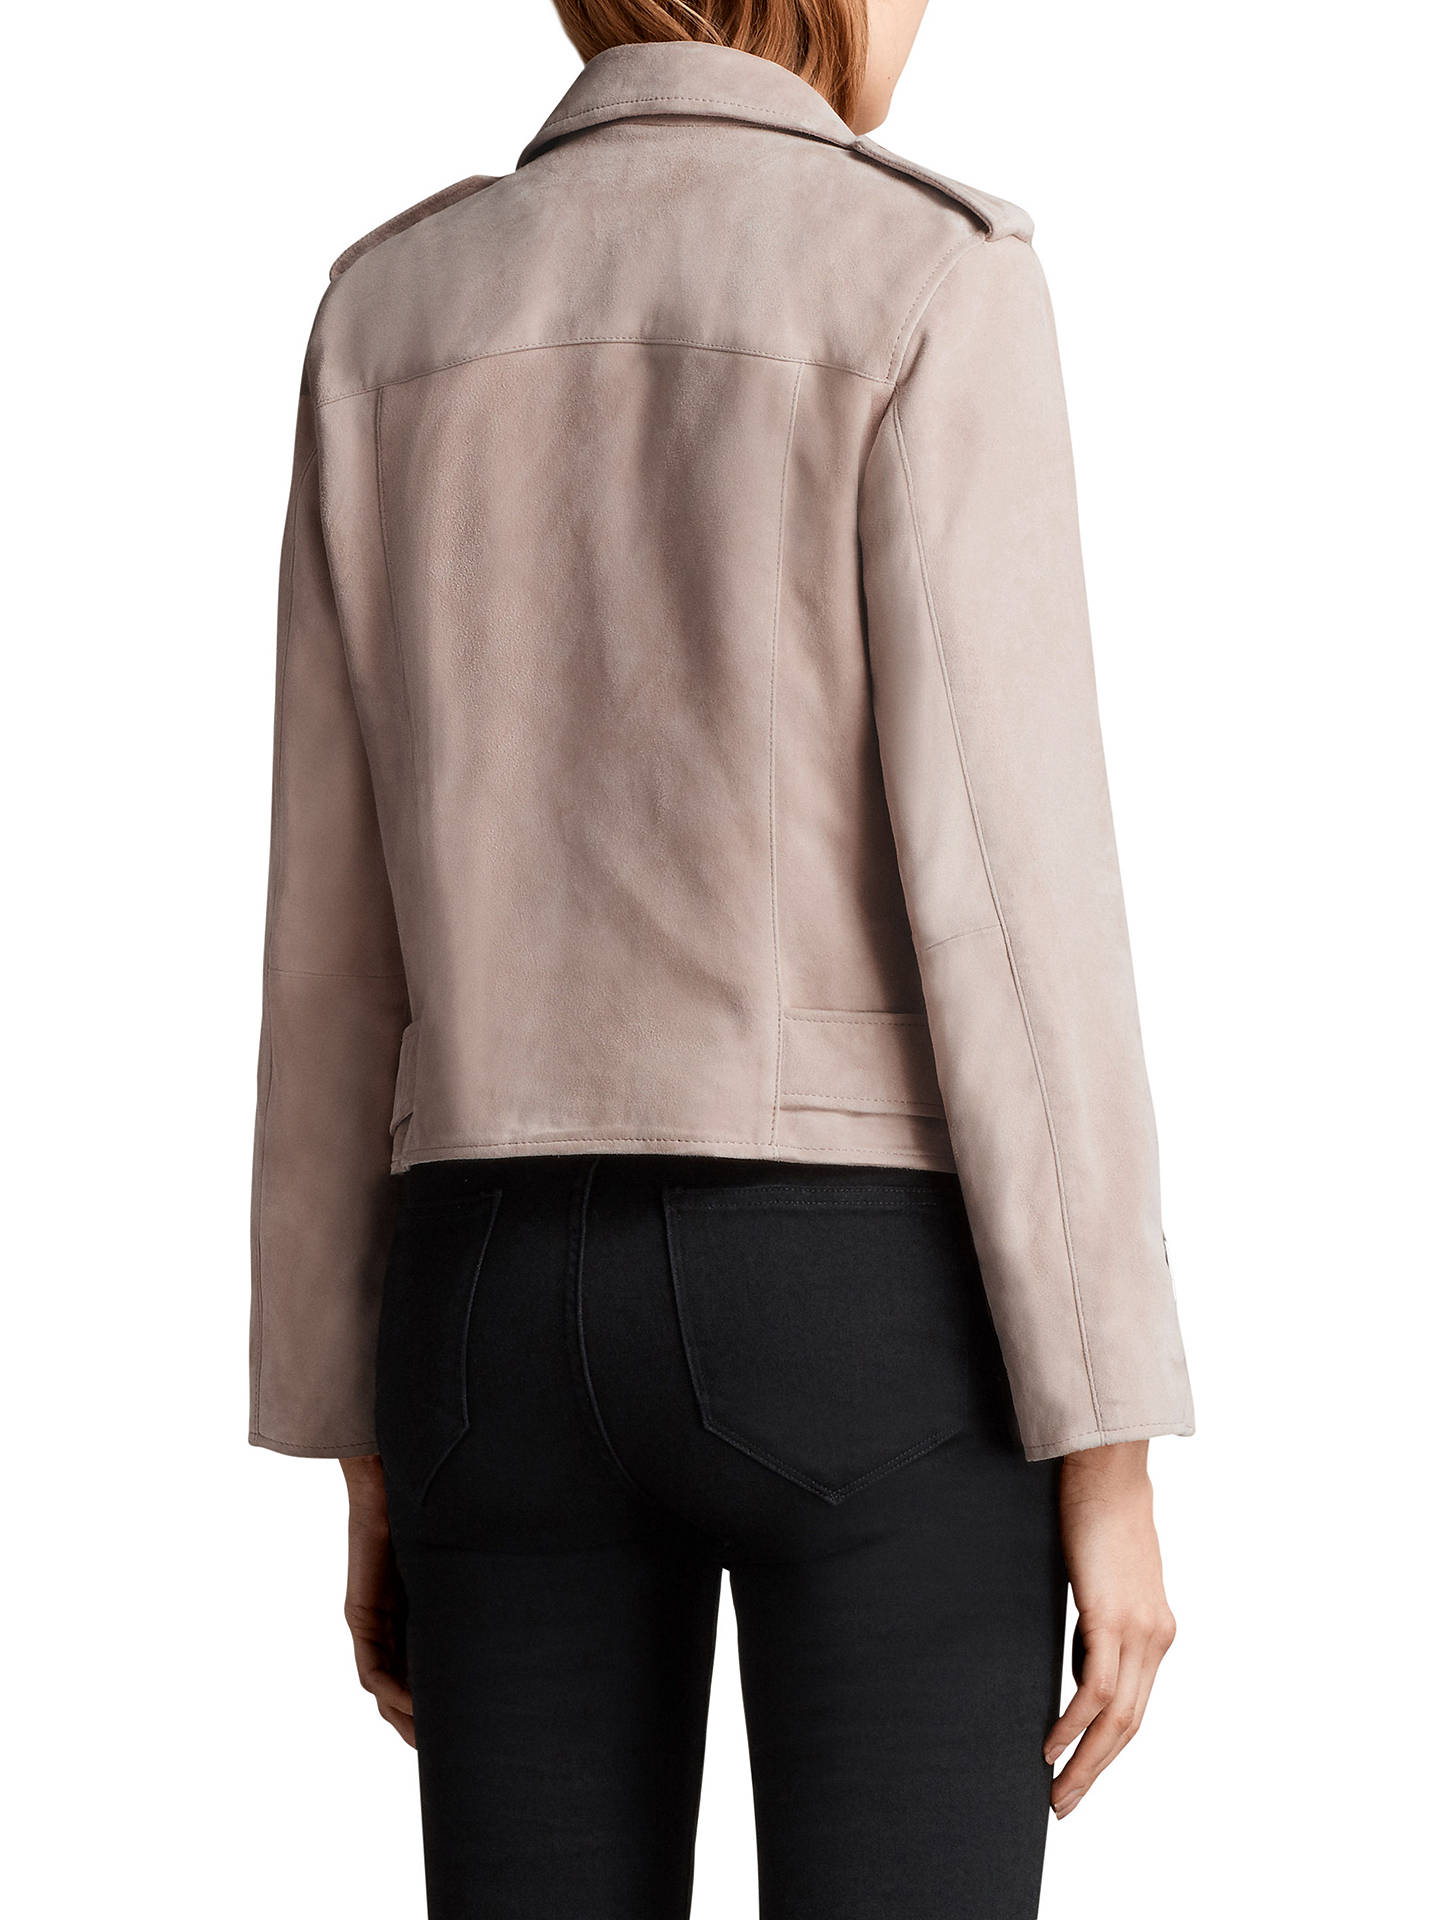 34cc0300239 ... Buy AllSaints Suede Balfern Biker Jacket, Pale Pink, 6 Online at  johnlewis.com ...